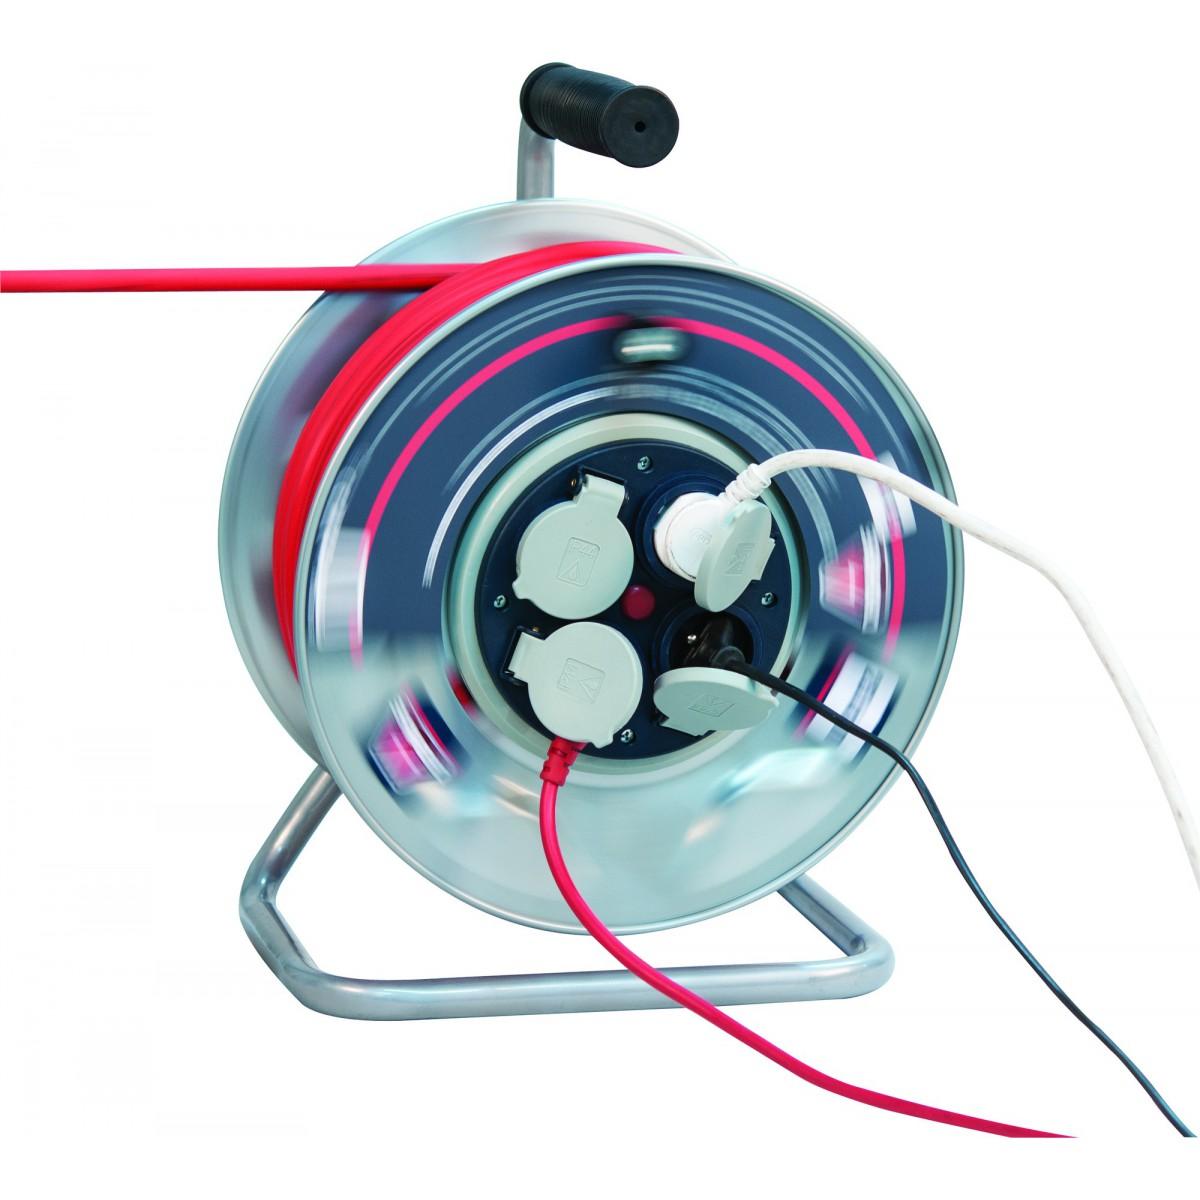 Enrouleur professionnel moyeu fixe Dhome - HO7 RN-F 3G 2,5 mm² - Longueur 40 m